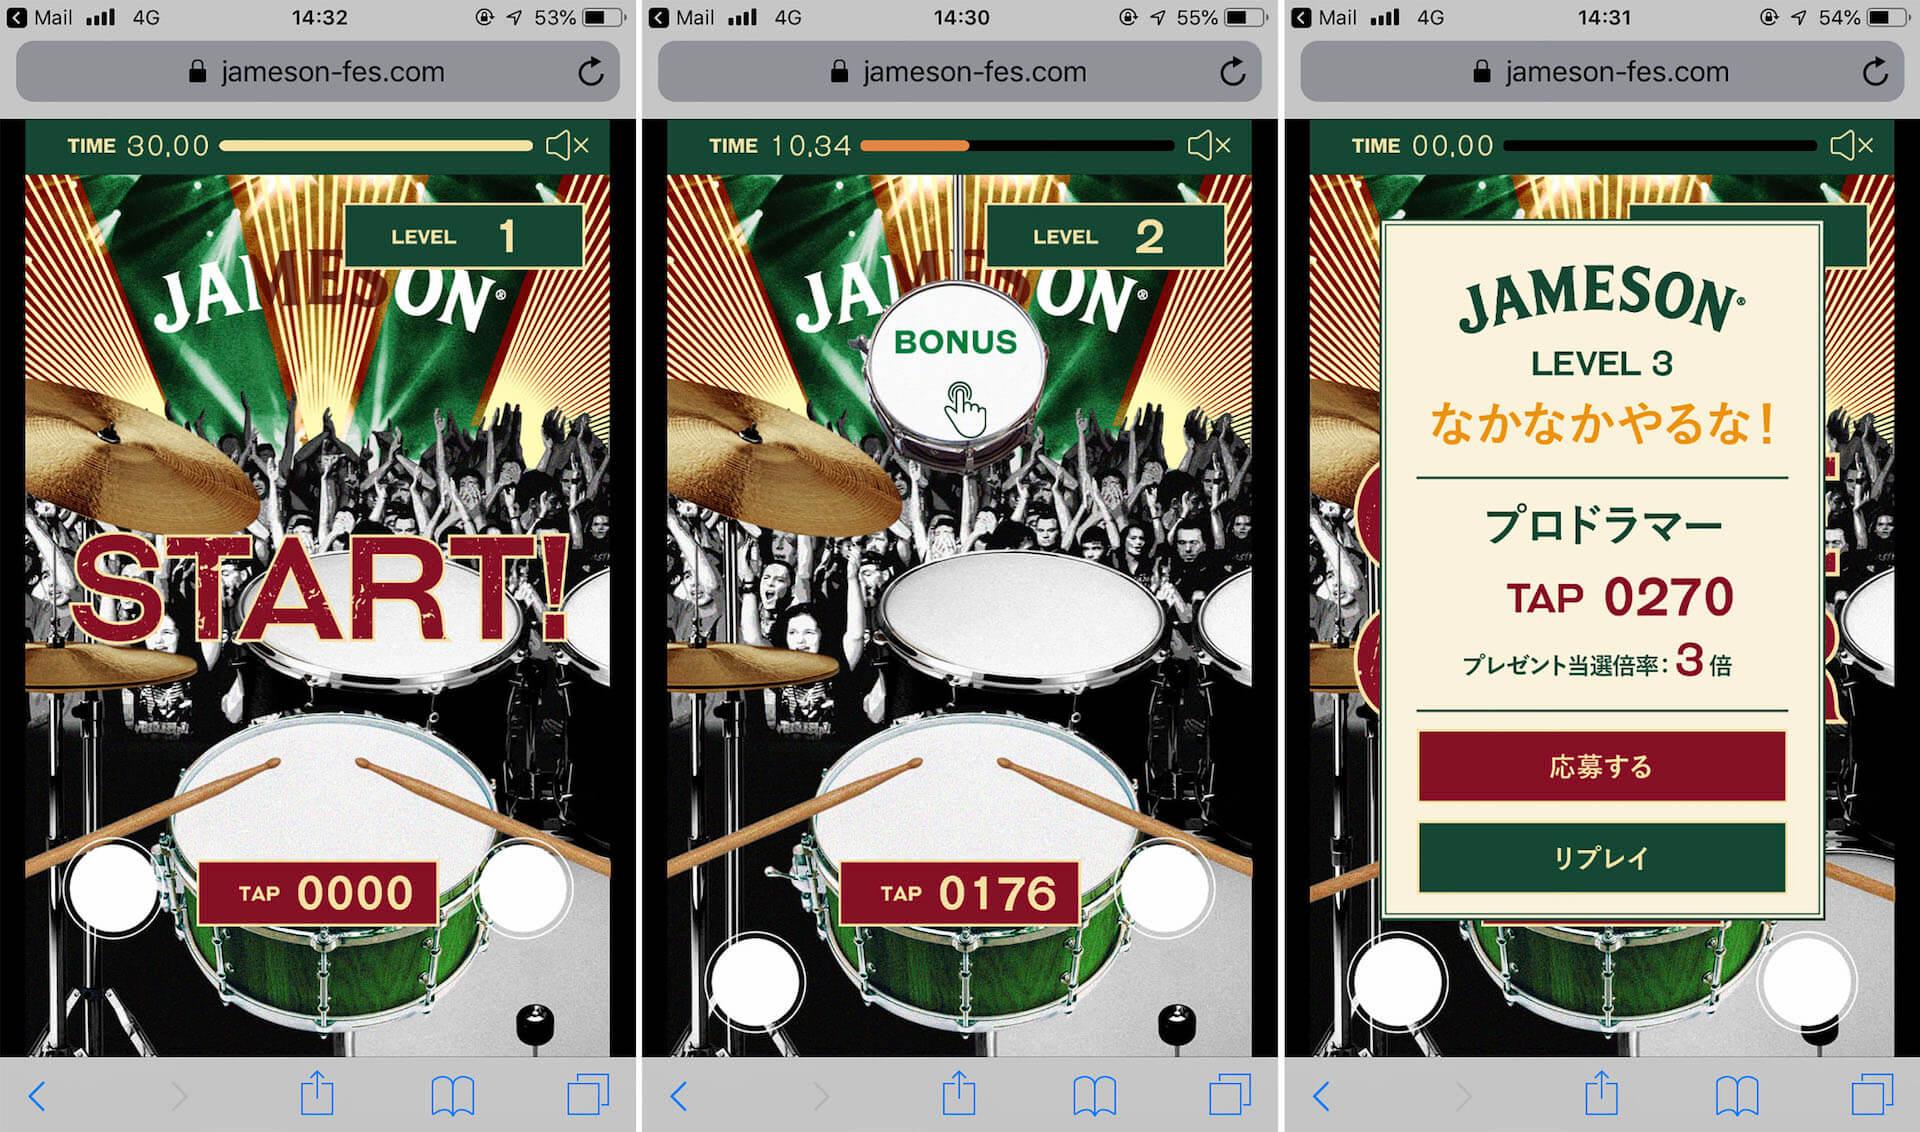 JAMESON×グッドモーニングアメリカ|金廣真悟が語る、お酒と音楽の関係性と<JAMESON HALLOWEEN FES 2>に向けて JM_Game_Flow